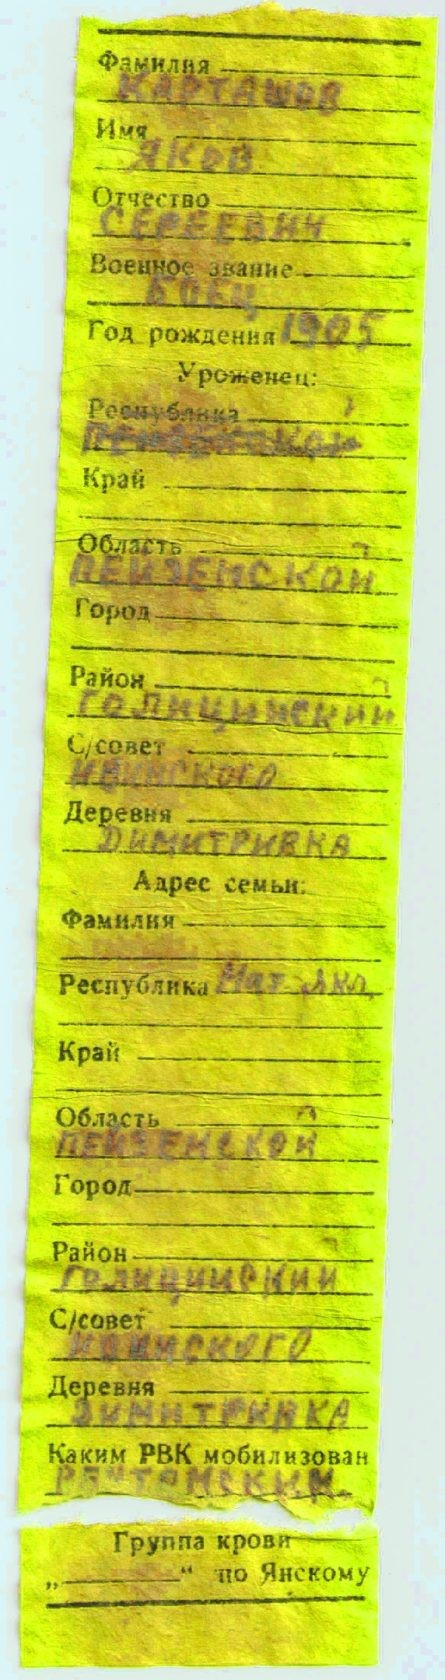 http://sh.uploads.ru/t/JuHg2.jpg